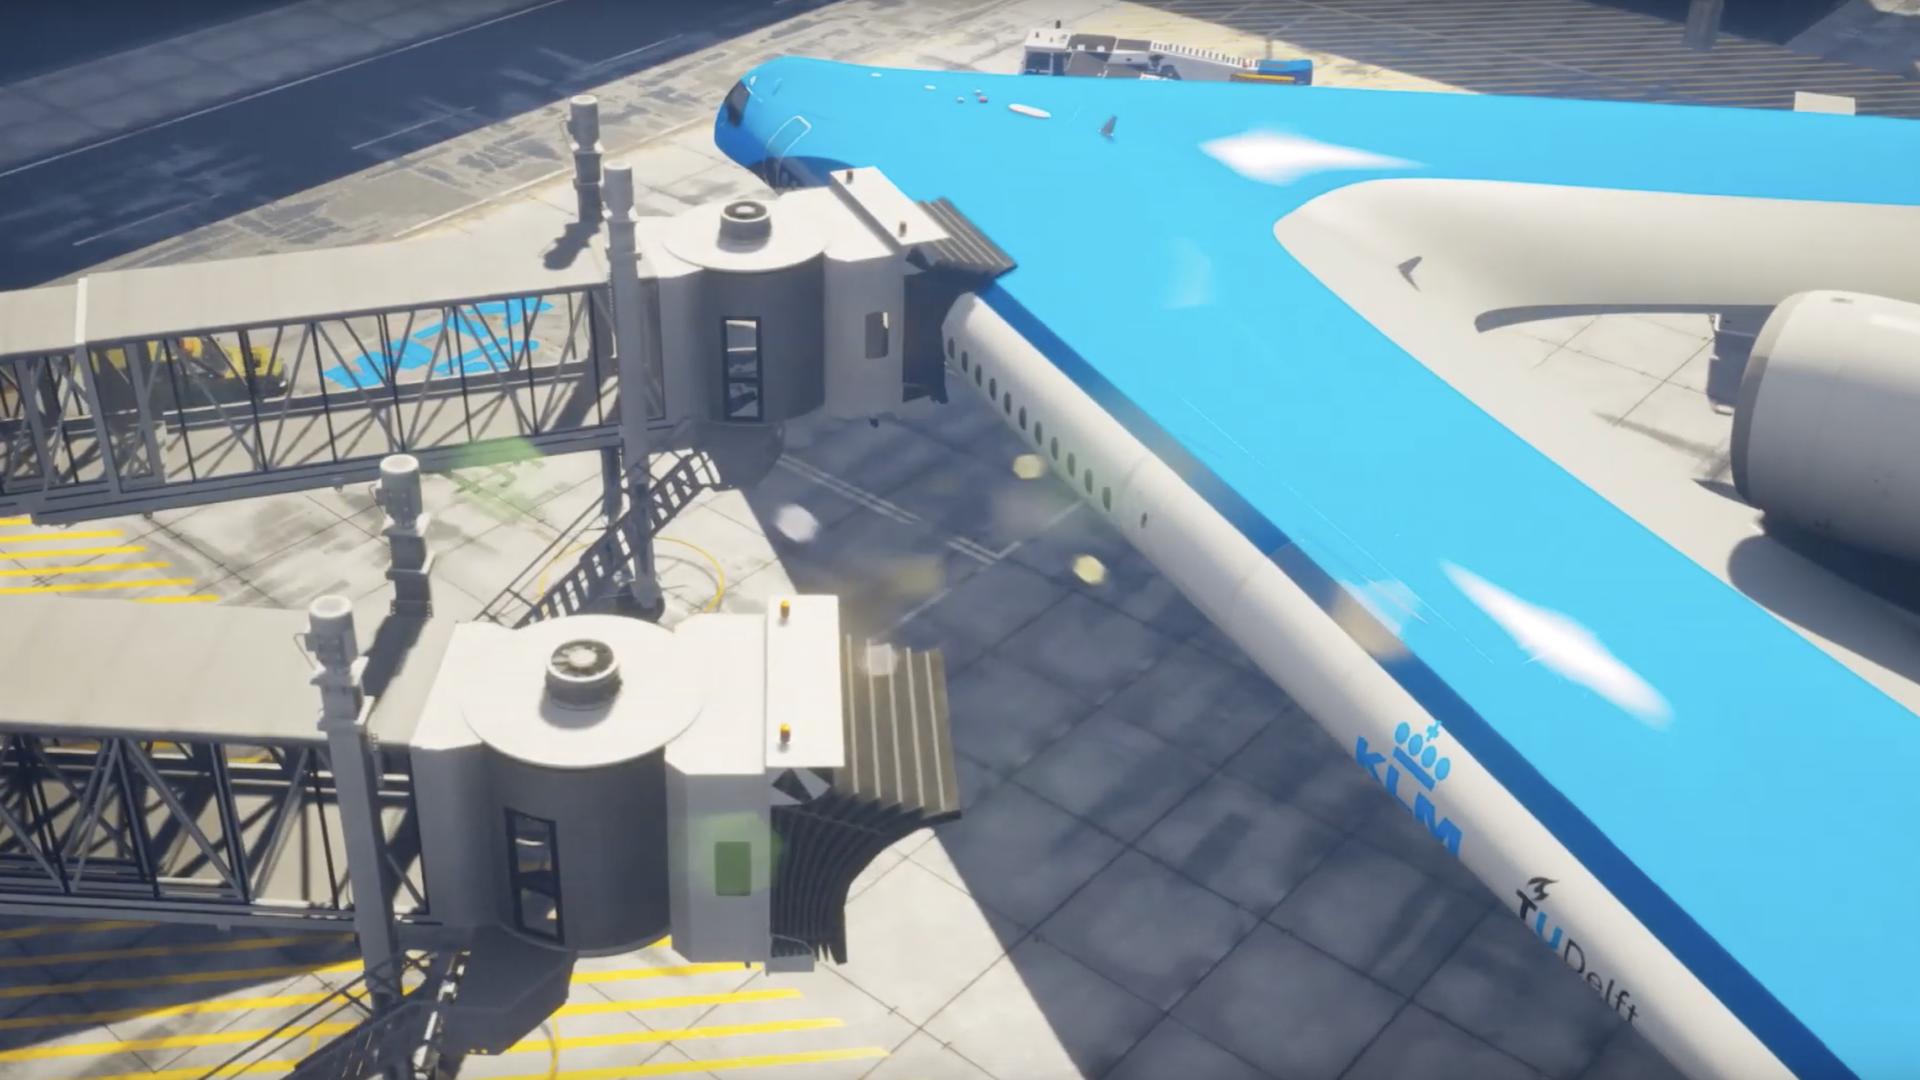 Prototipo Flying V en pista de aterrizaje